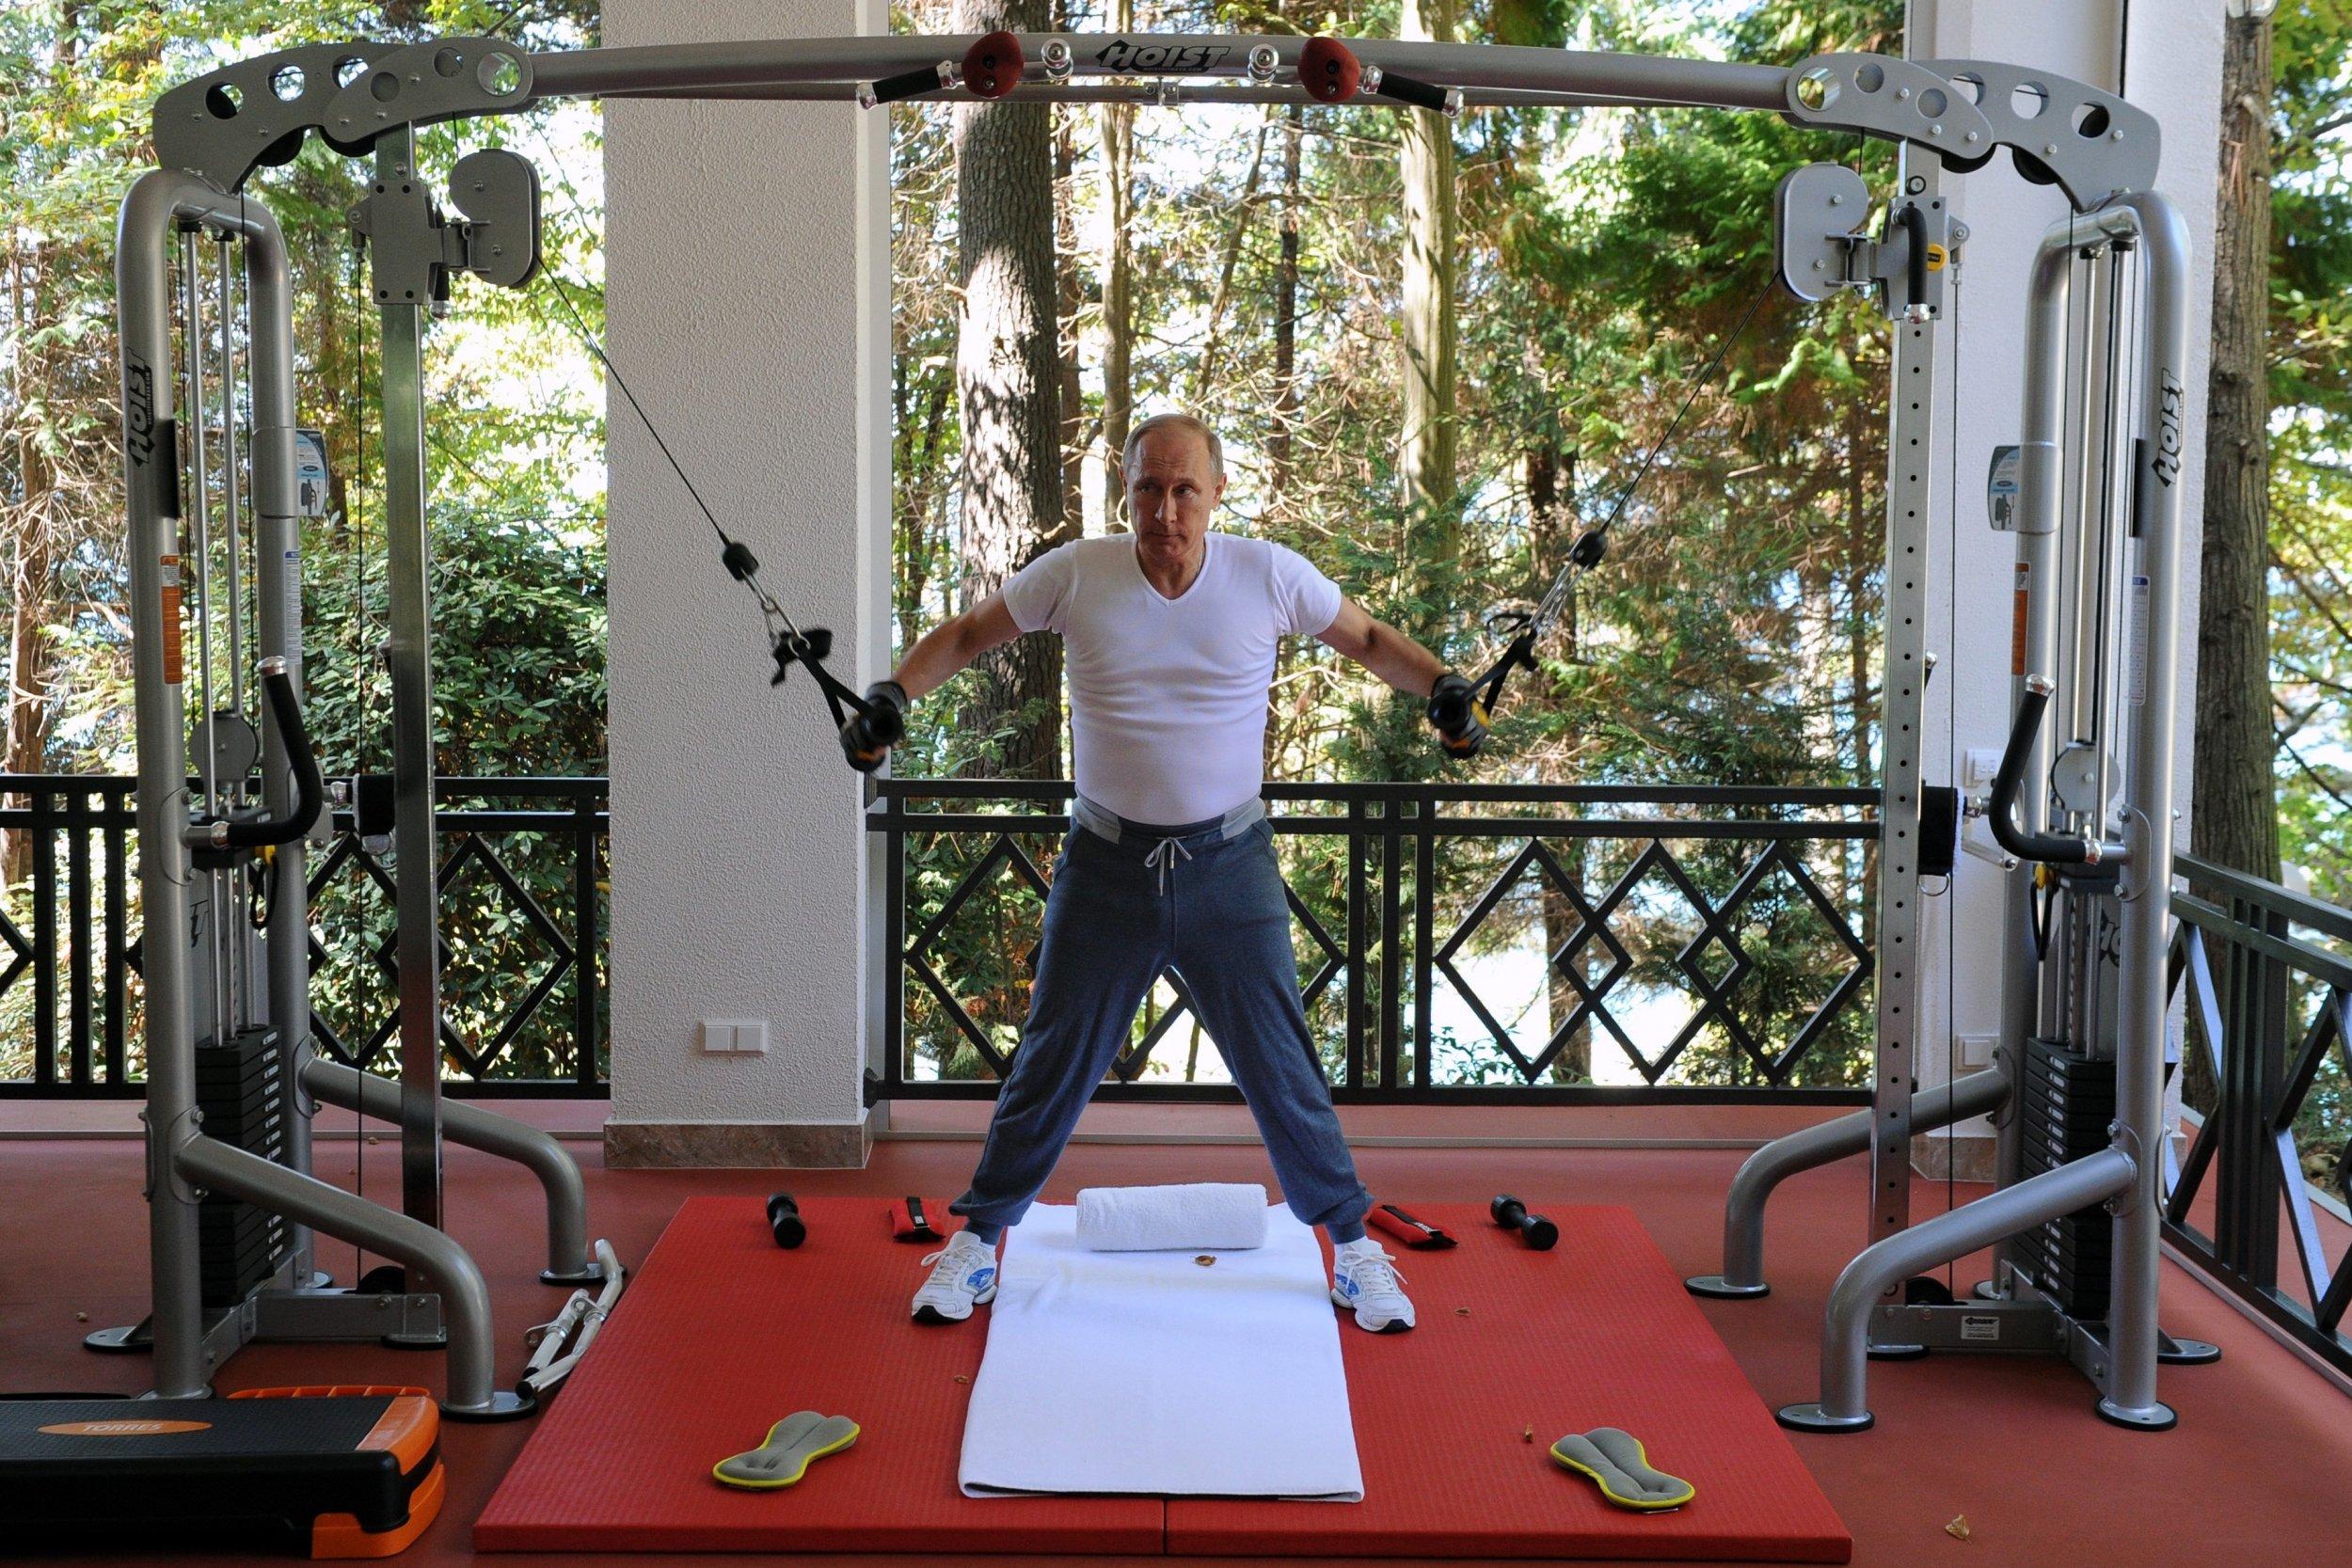 Vladimir Putin has seen scores of Russian athletes test positive for meldonium.